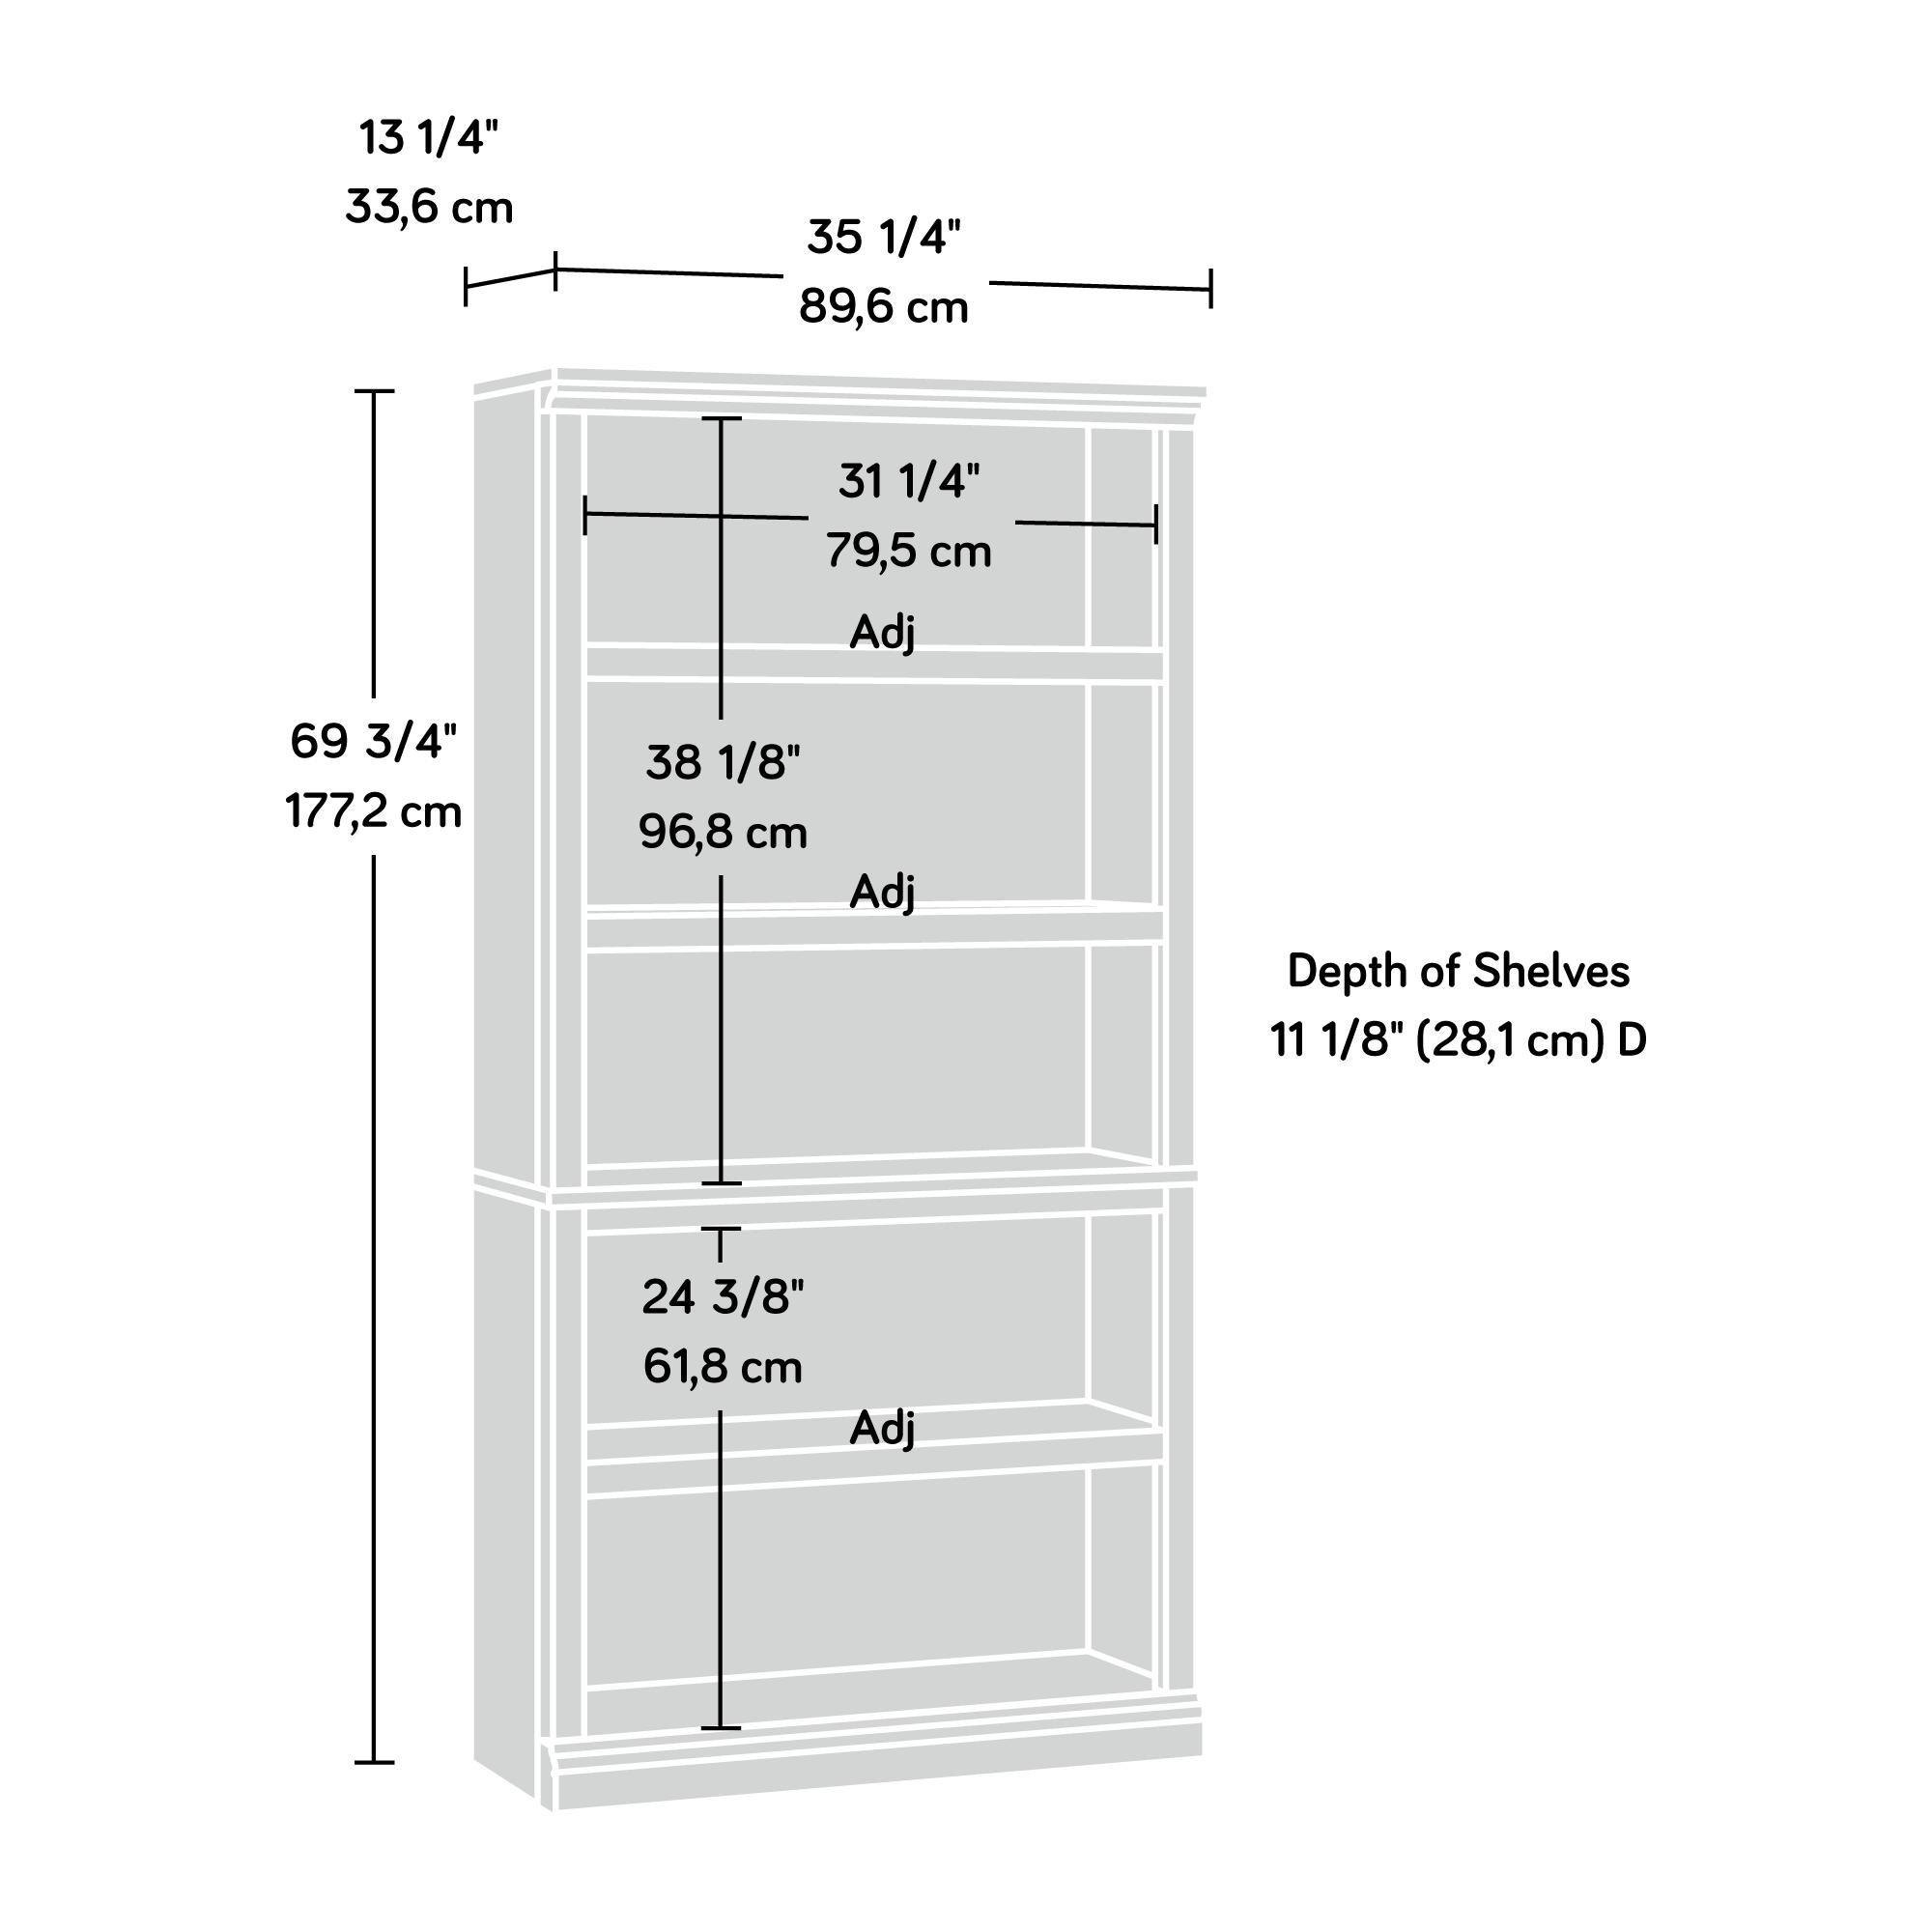 House Wiring Diagram Moreover Beats Studio Wireless Headphones Diagram